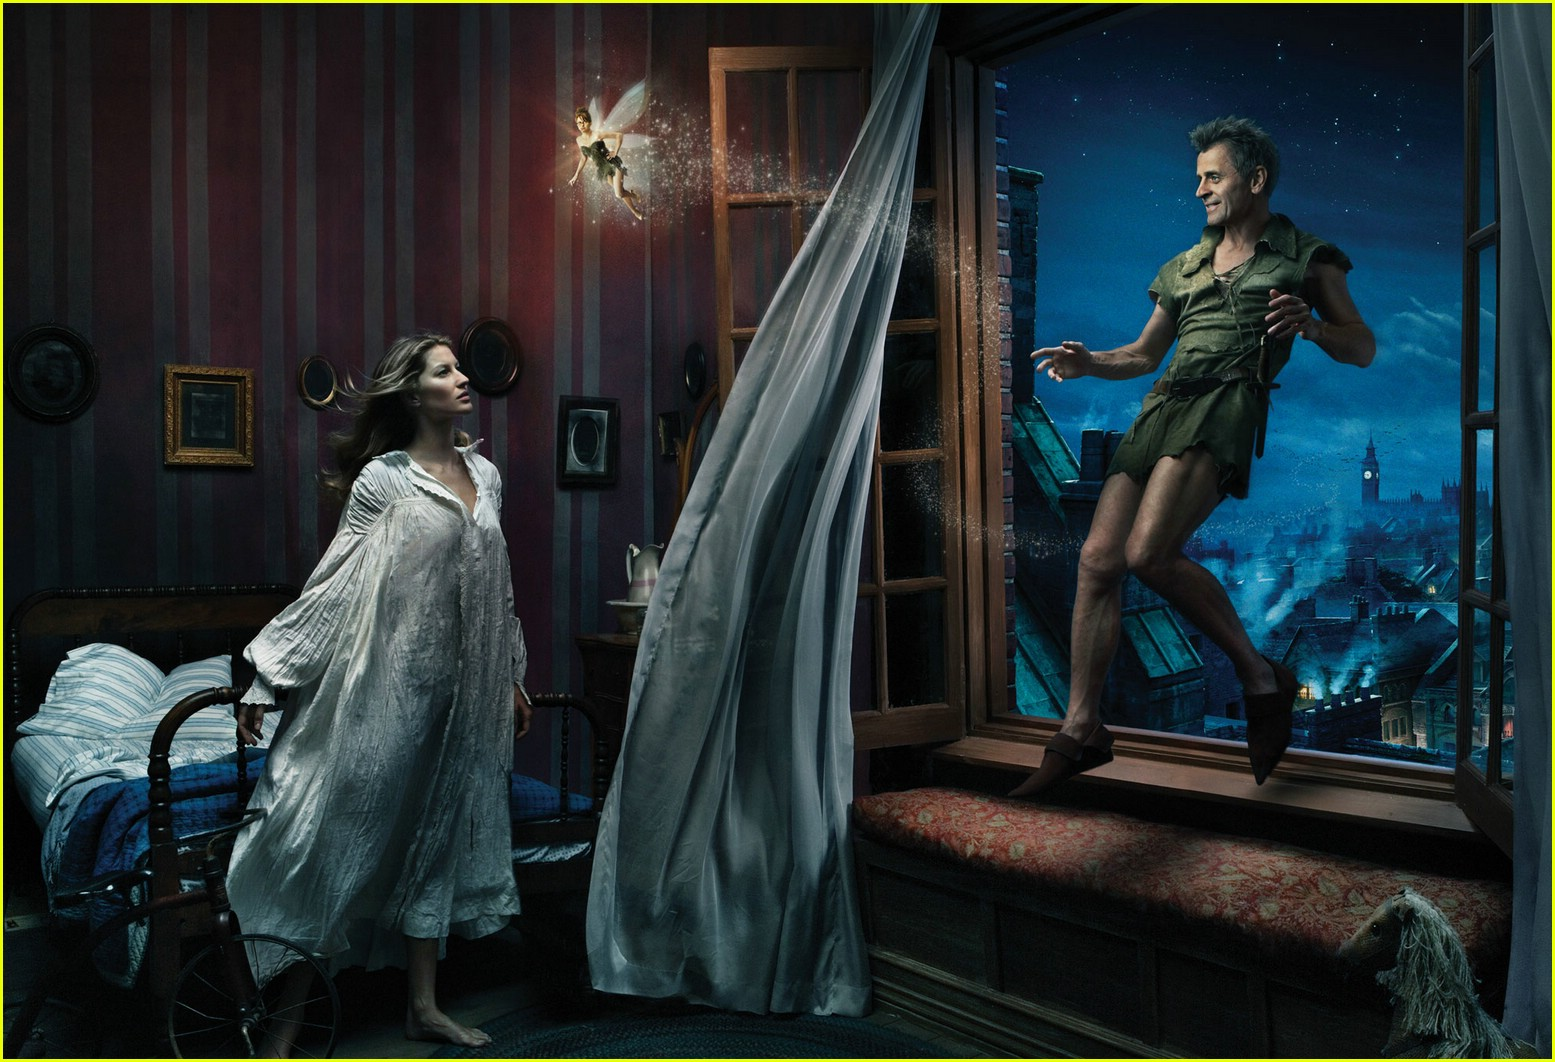 http://3.bp.blogspot.com/_C4isIrqW5Yk/TGTEALjEerI/AAAAAAAAF_g/oF_sGr3BOvs/s1600/disney-dream-ads-annie-leibovitz-08.jpg